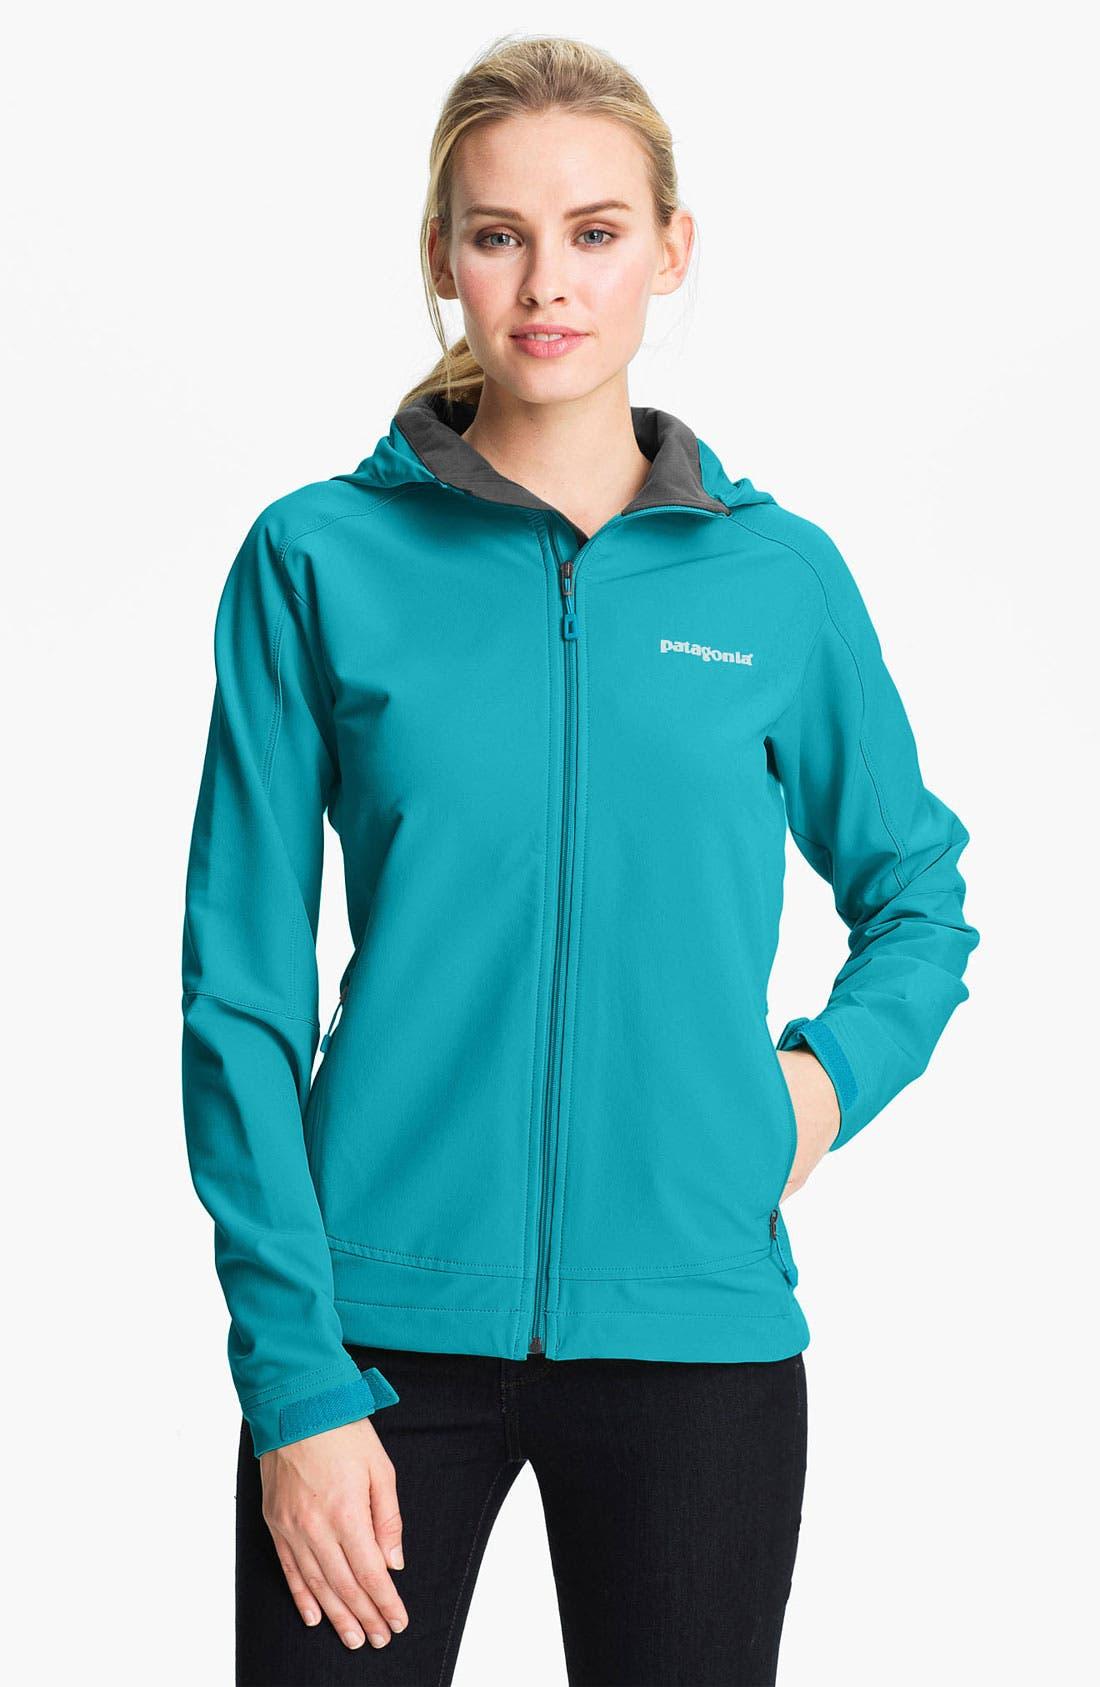 Main Image - Patagonia 'Simple Guide' Hooded Jacket